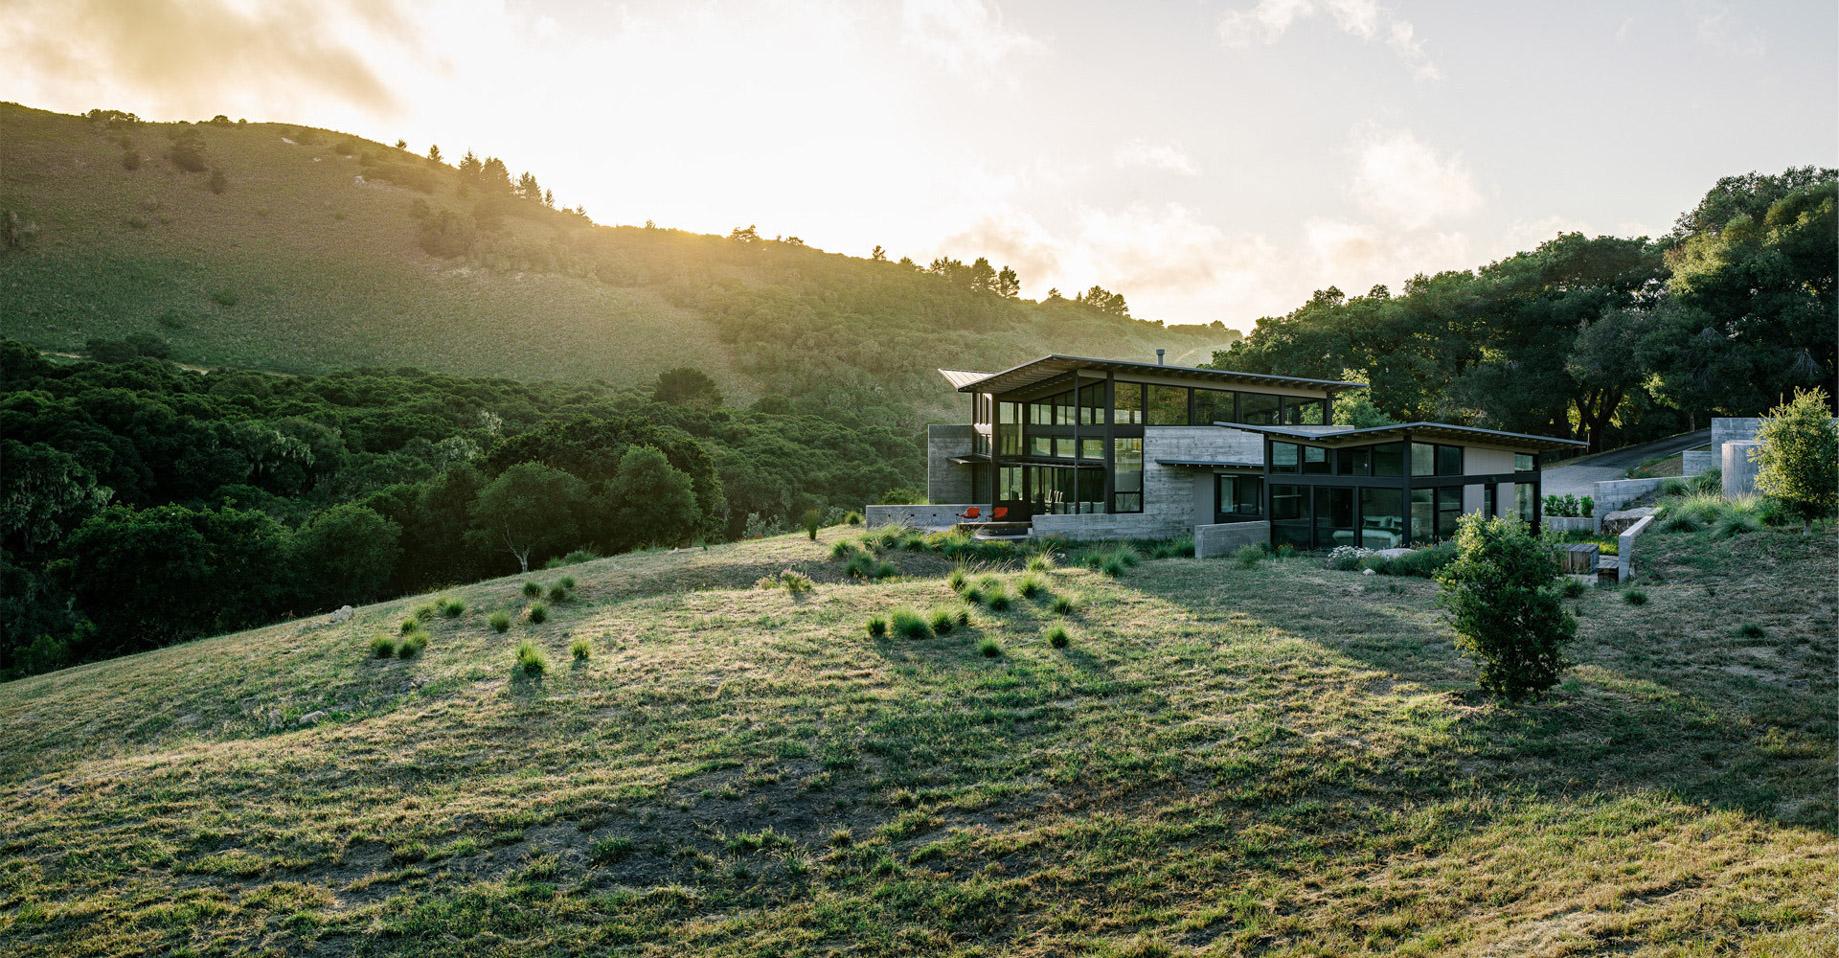 Pano – Butterfly House – Santa Lucia Preserve, Carmel, CA, USA